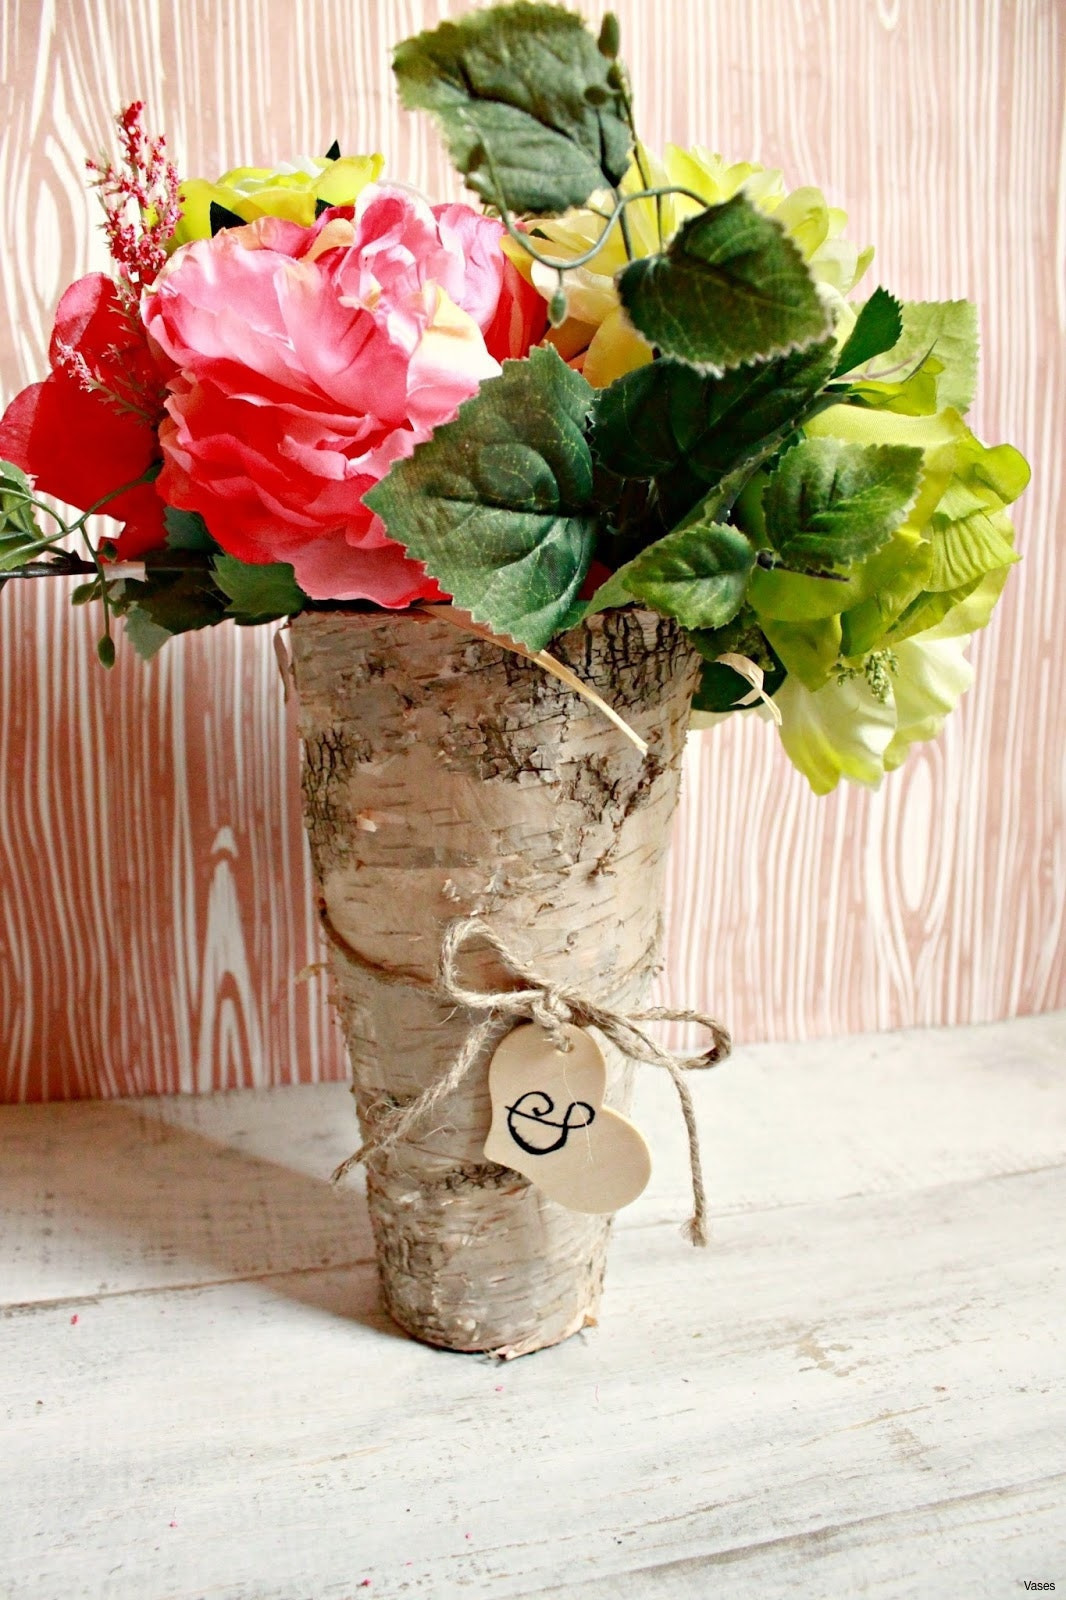 tiffany crystal bud vase of mini glass vase image elegant flower arrangements diy h vases diy inside mini glass vase image elegant flower arrangements diy h vases diy wood vase i 0d base